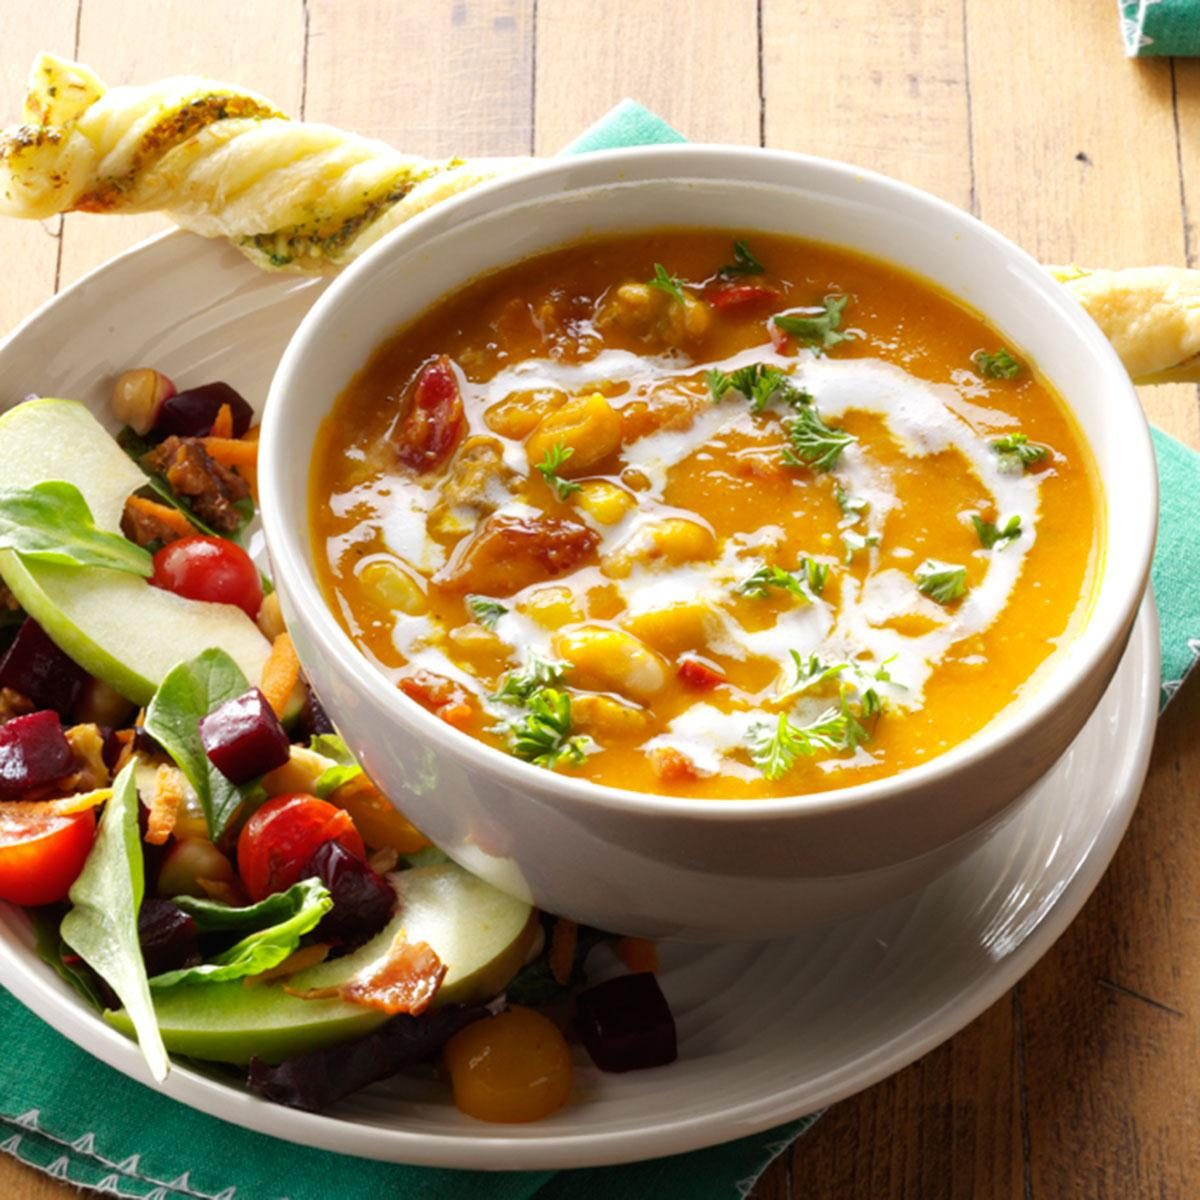 Hearty Butternut Squash Soup Recipe | Taste of Home